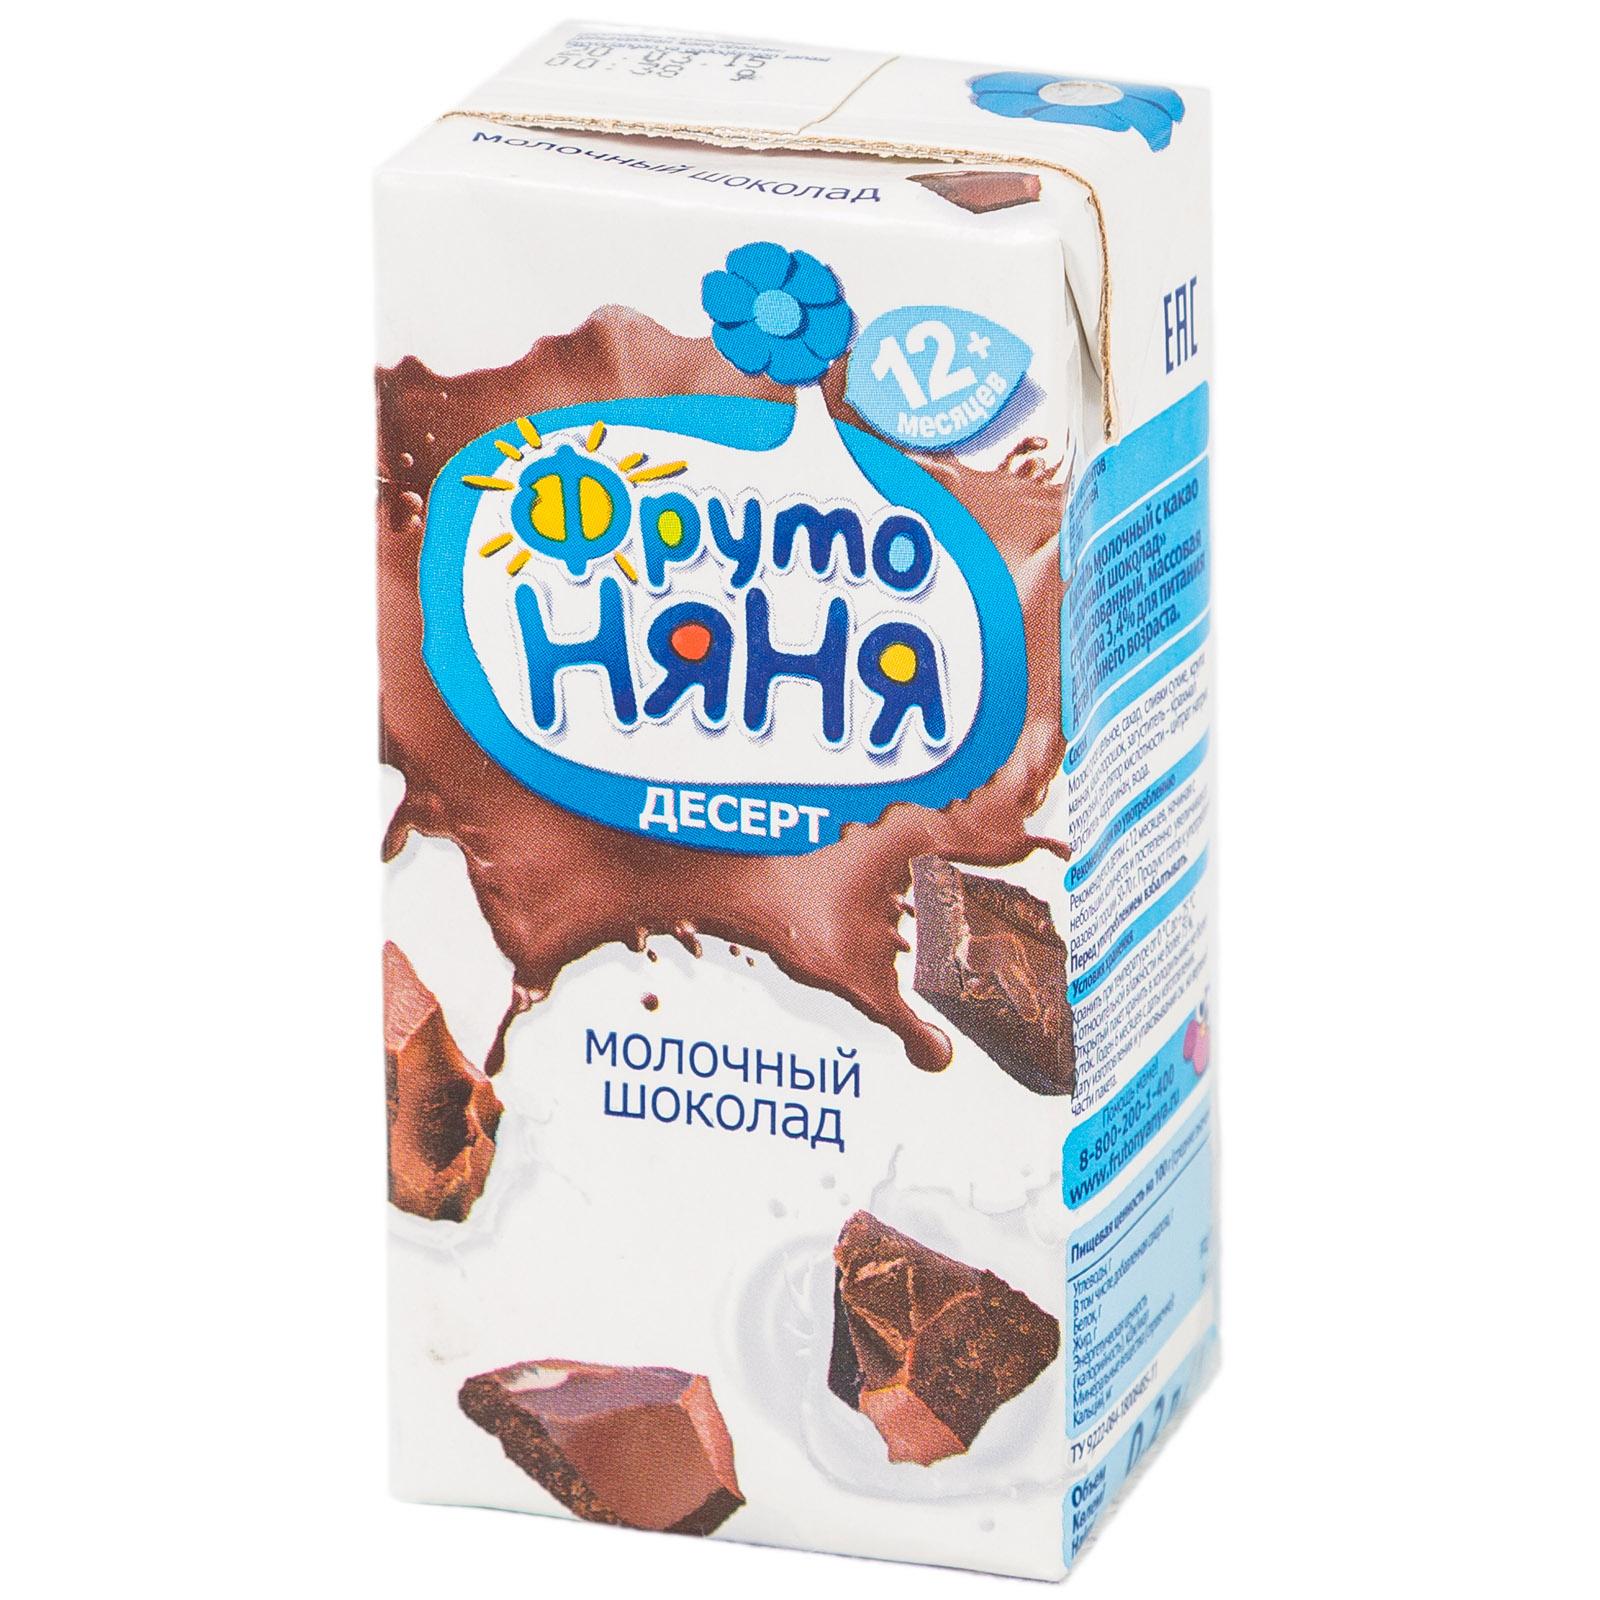 Десерт Фрутоняня 200 мл Молочный шоколад 3,4% (с 12 мес)<br>